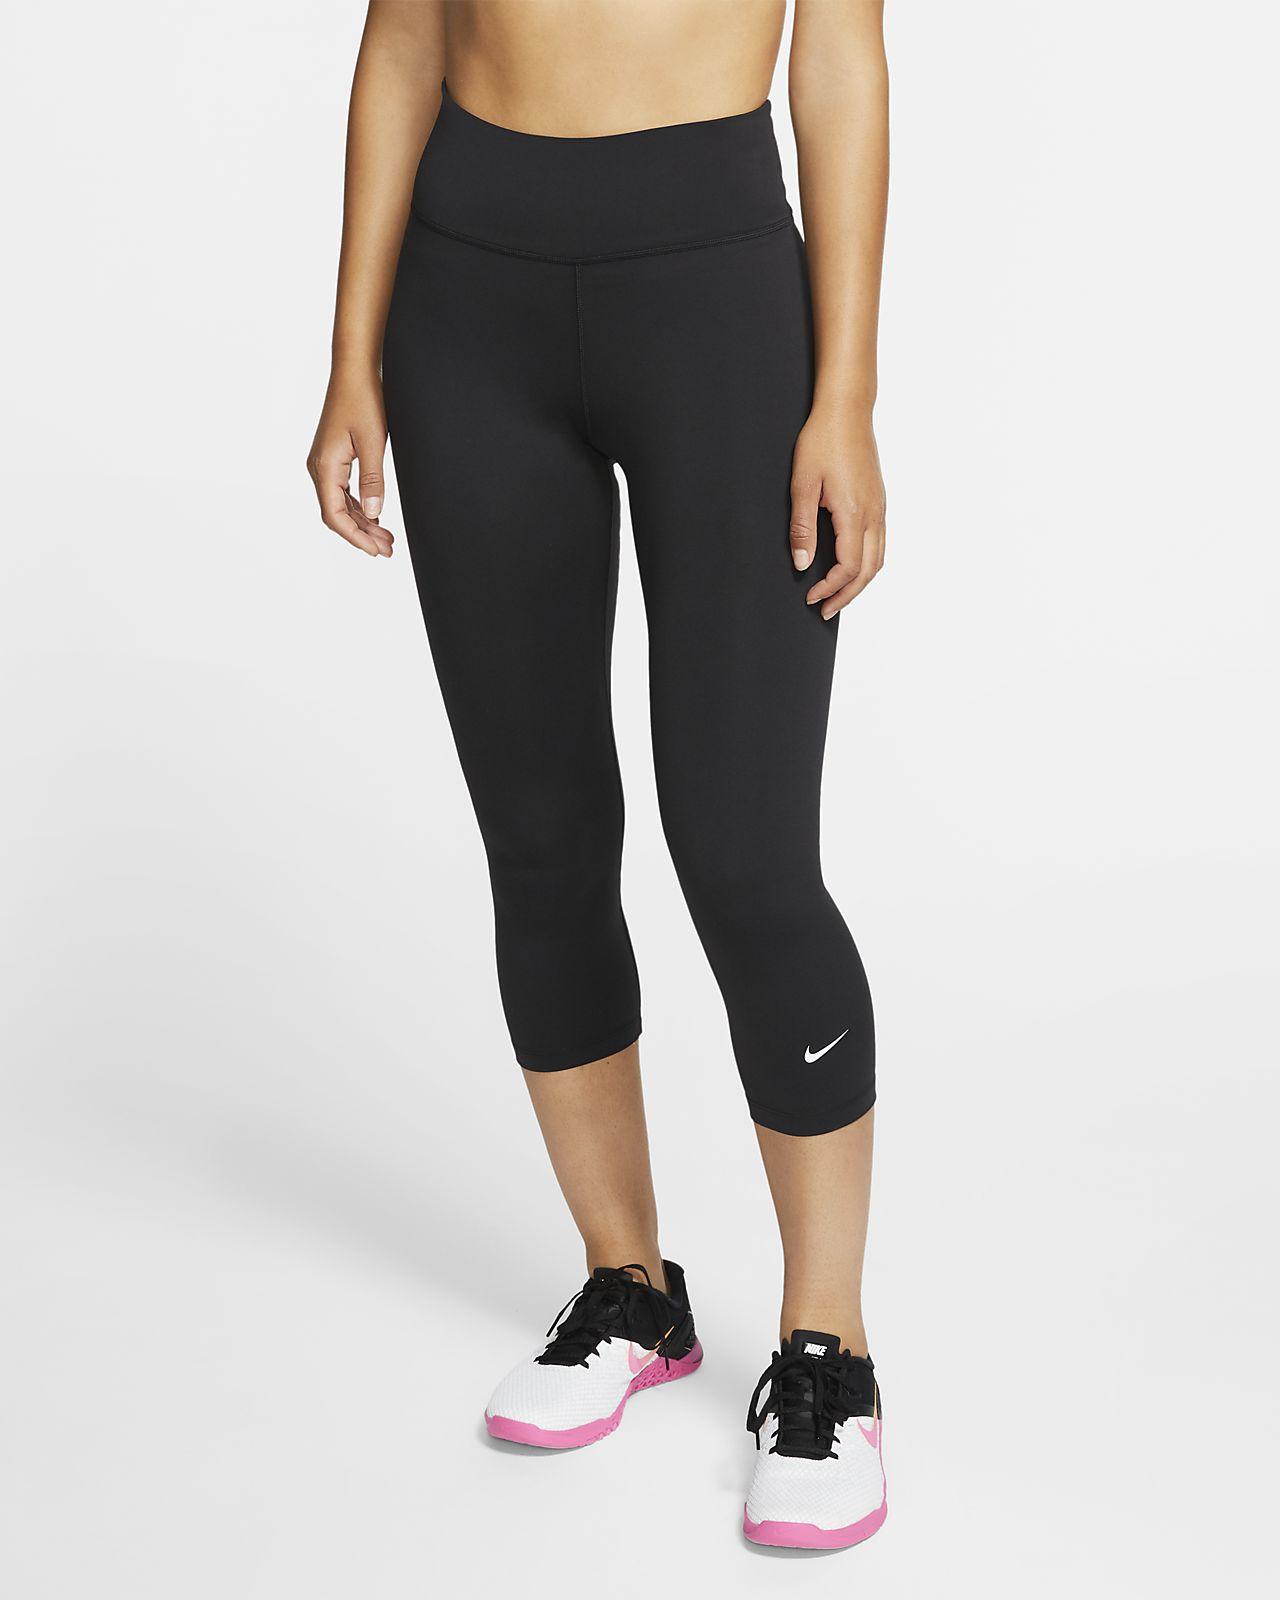 Pantalones capri para mujer Nike One